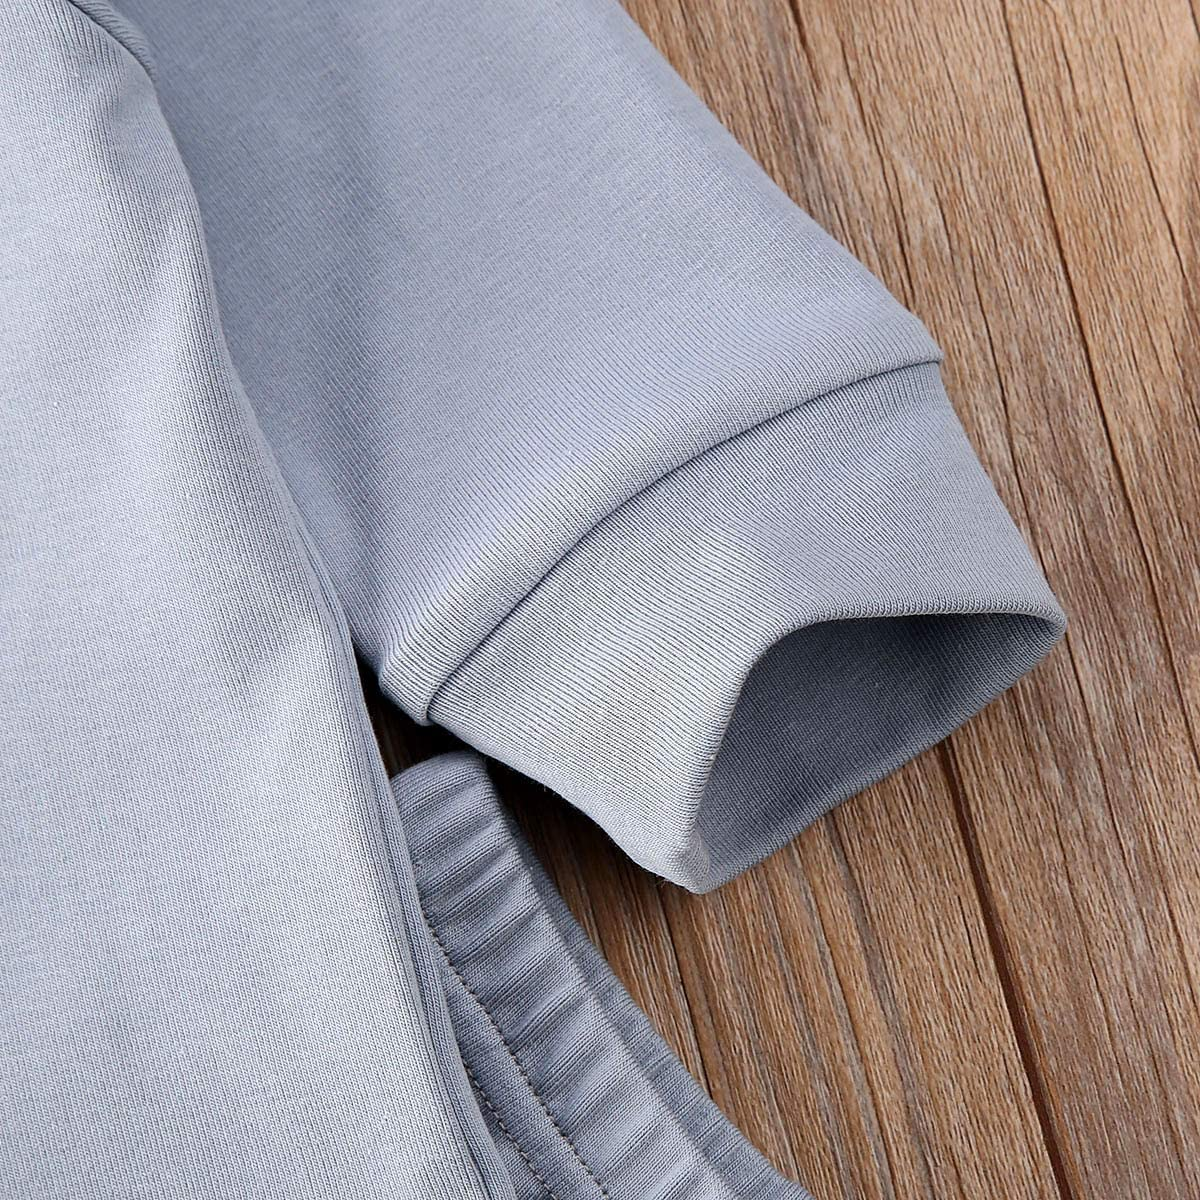 Kuriozud Baby Boy Girl Pajamas Set Organic Cotton Plain Sleepwear Infant Long Sleeve Homewear